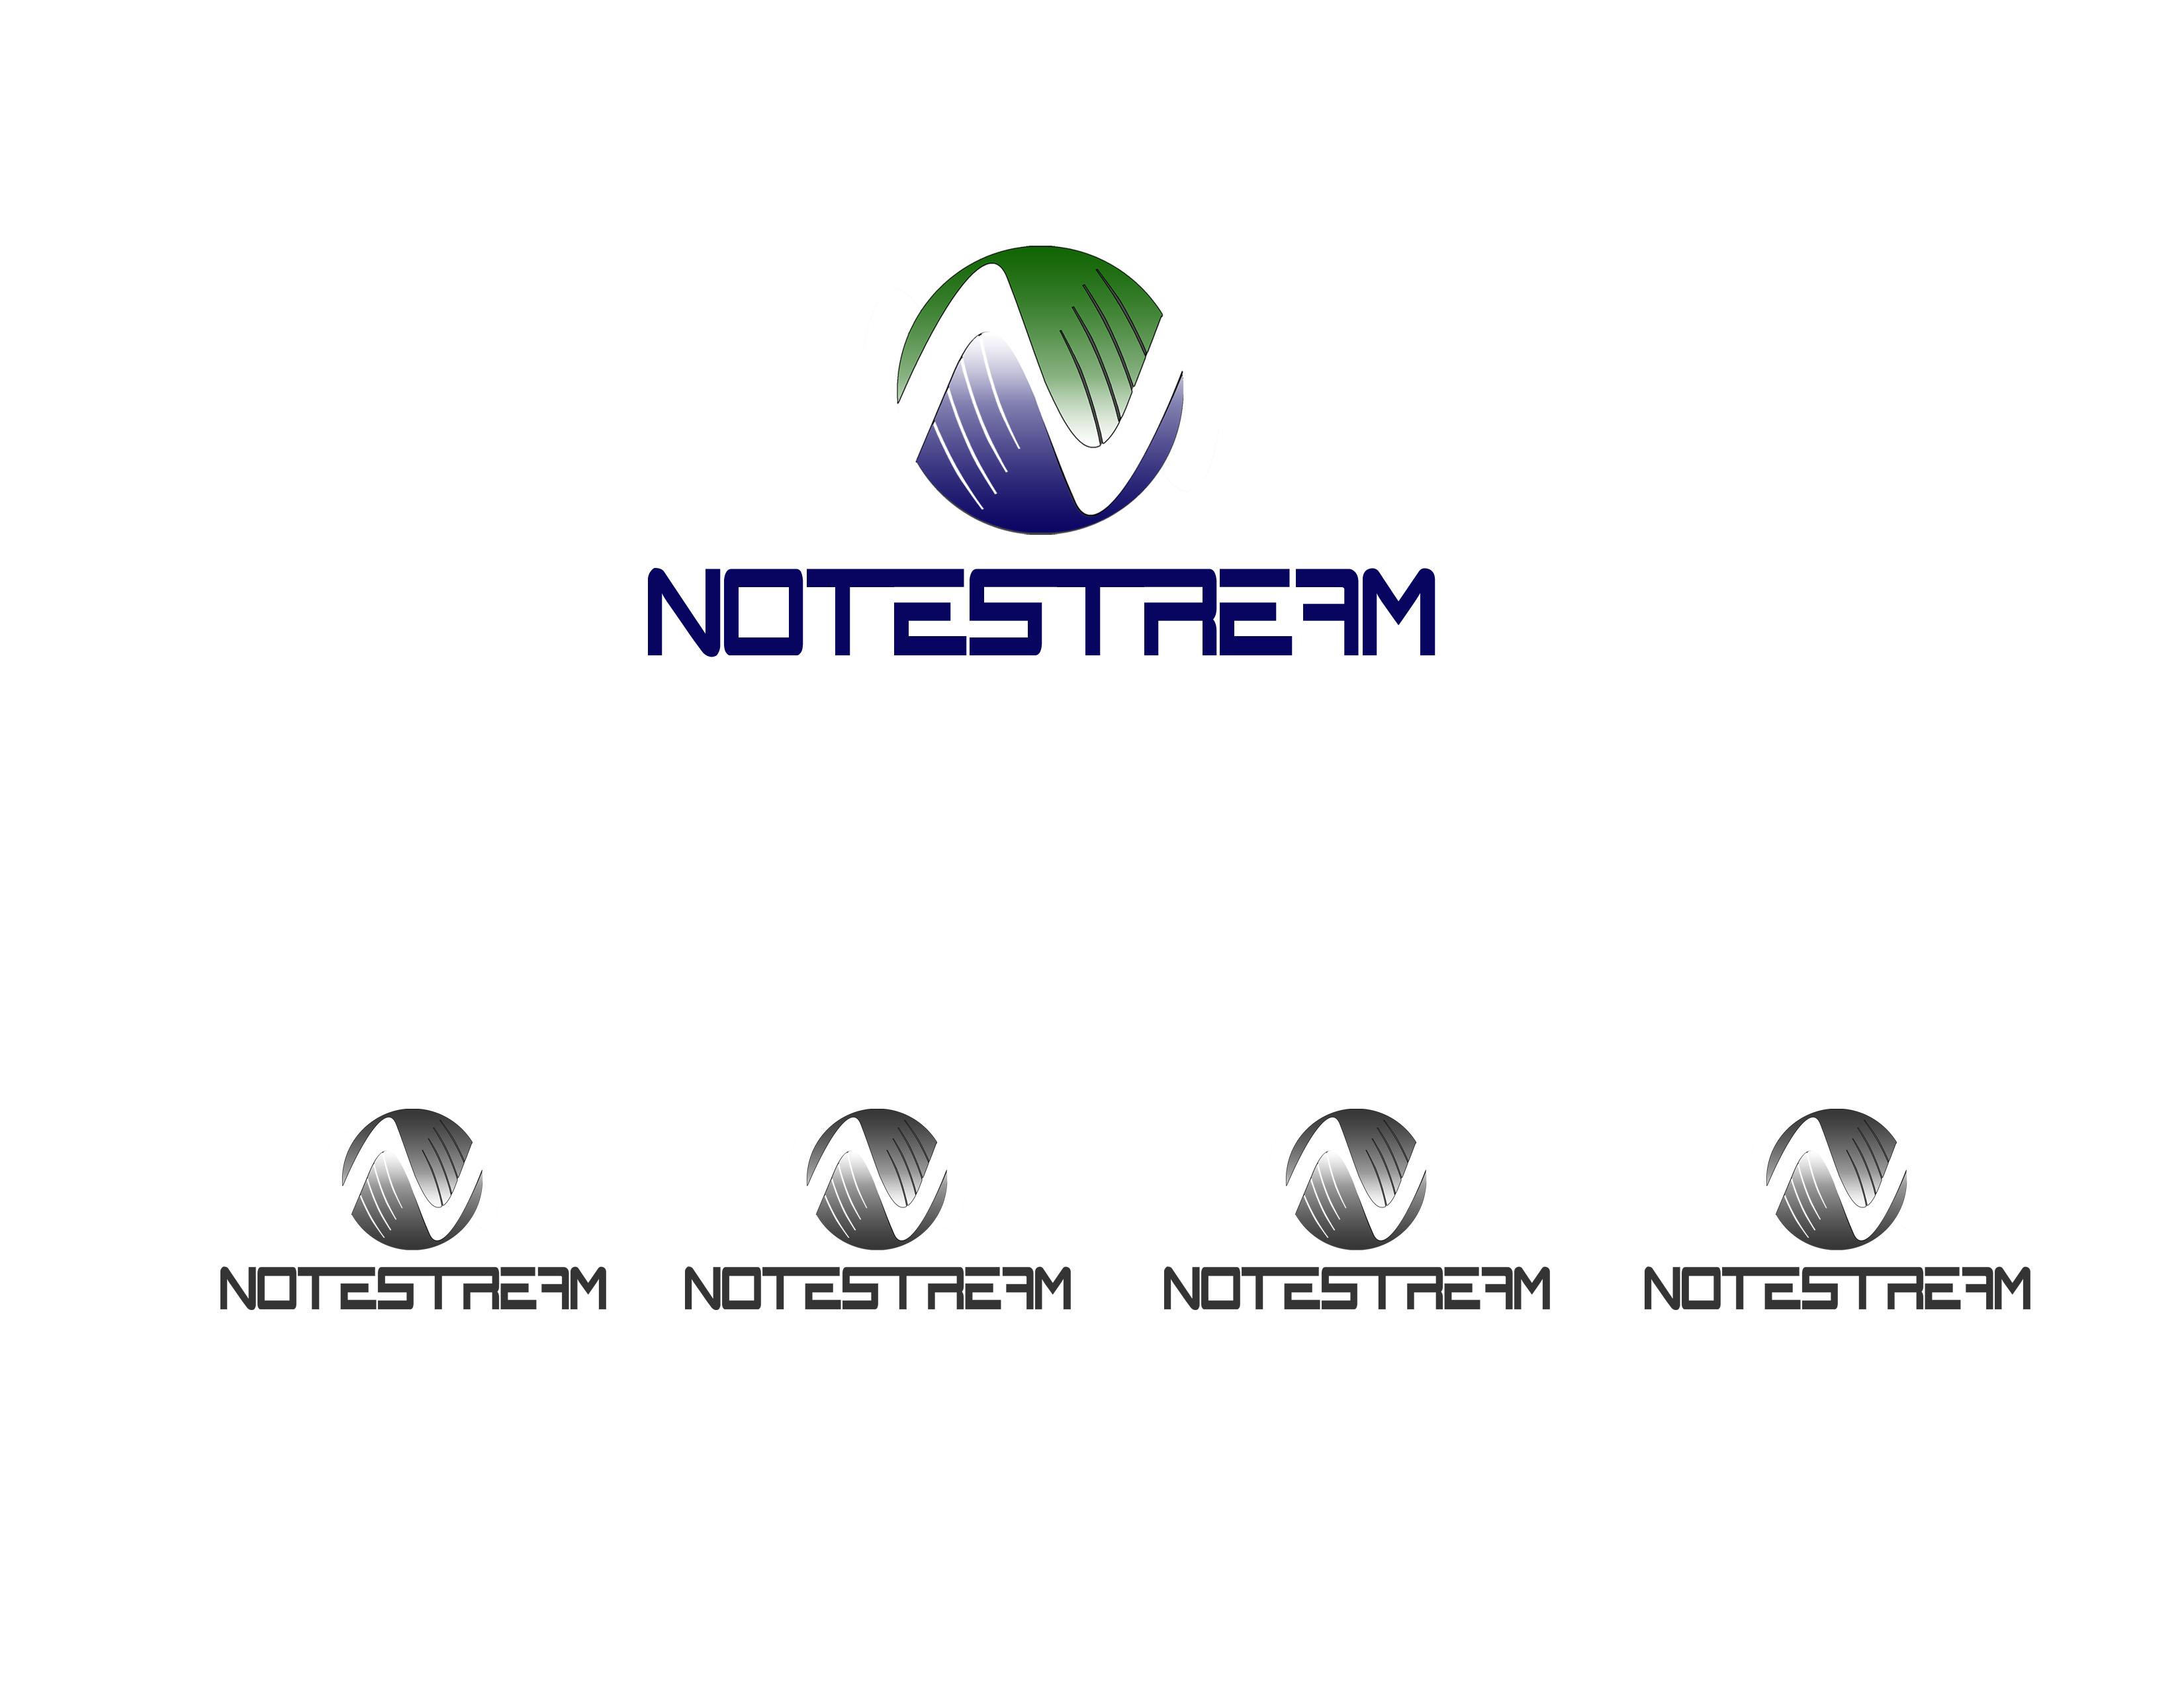 Logo Design by Alan Esclamado - Entry No. 30 in the Logo Design Contest Imaginative Logo Design for NoteStream.